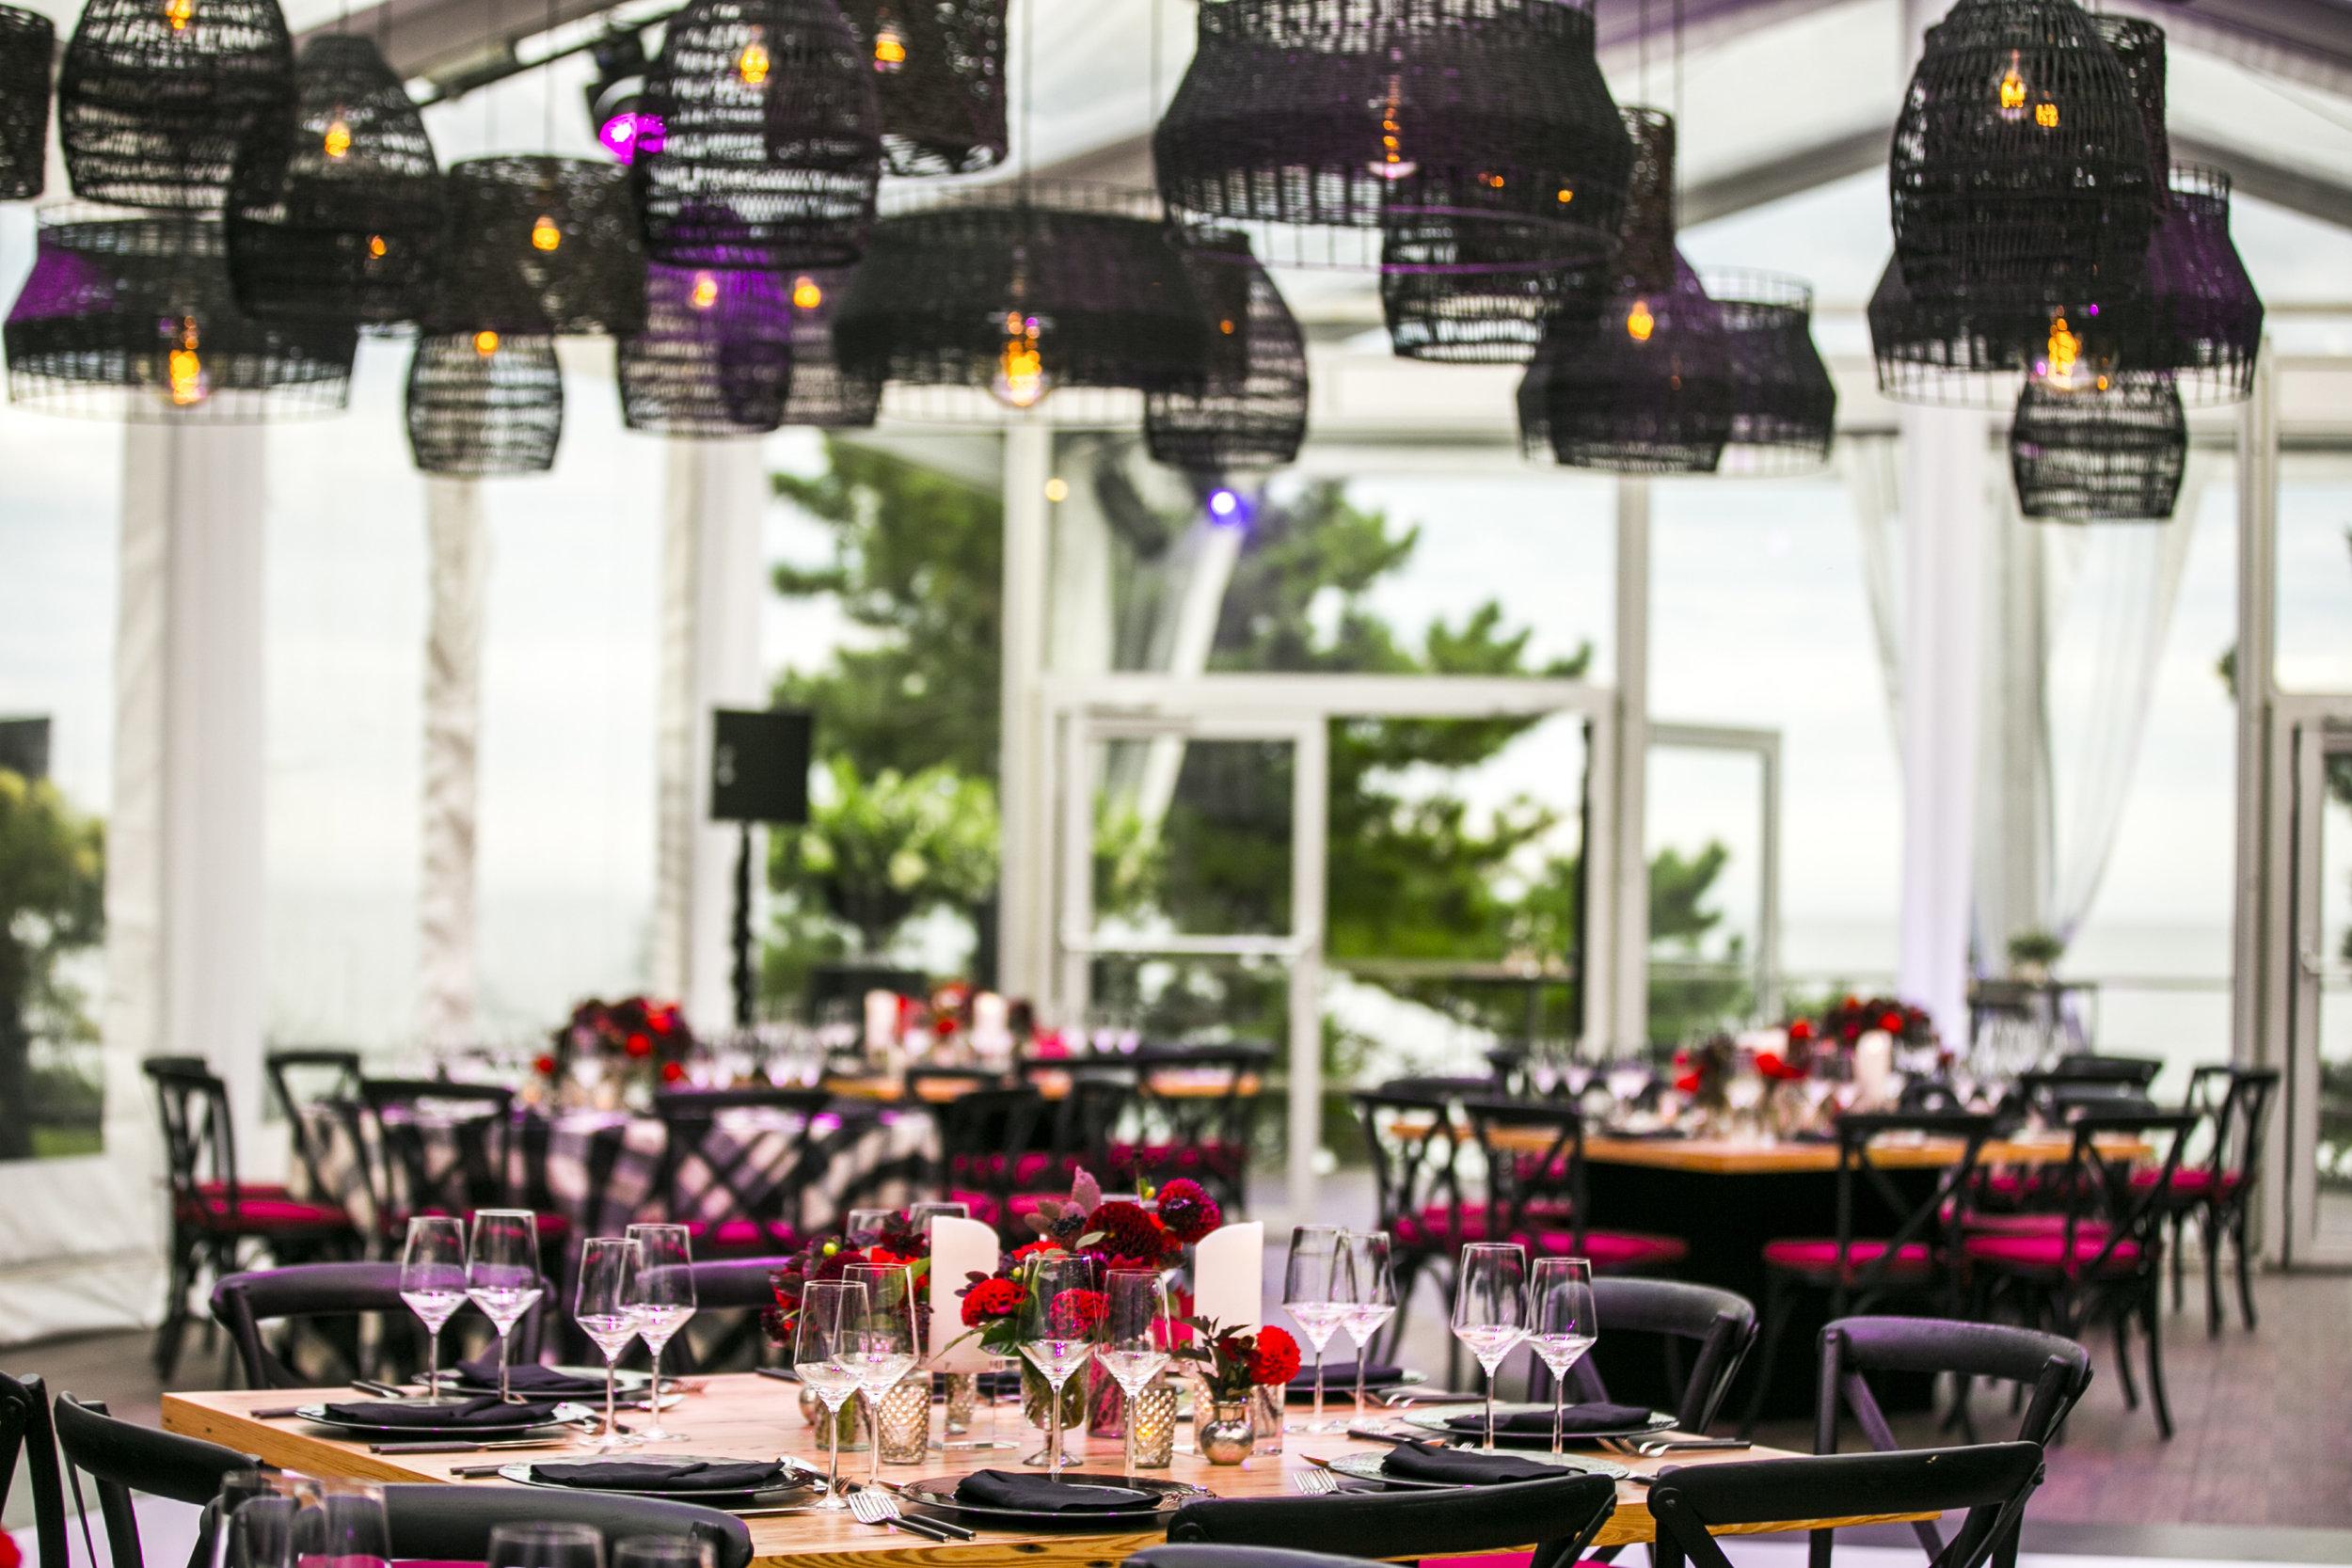 Dinner Party Mood Lighting Rafanelli Events Port Lighting Systems.jpg